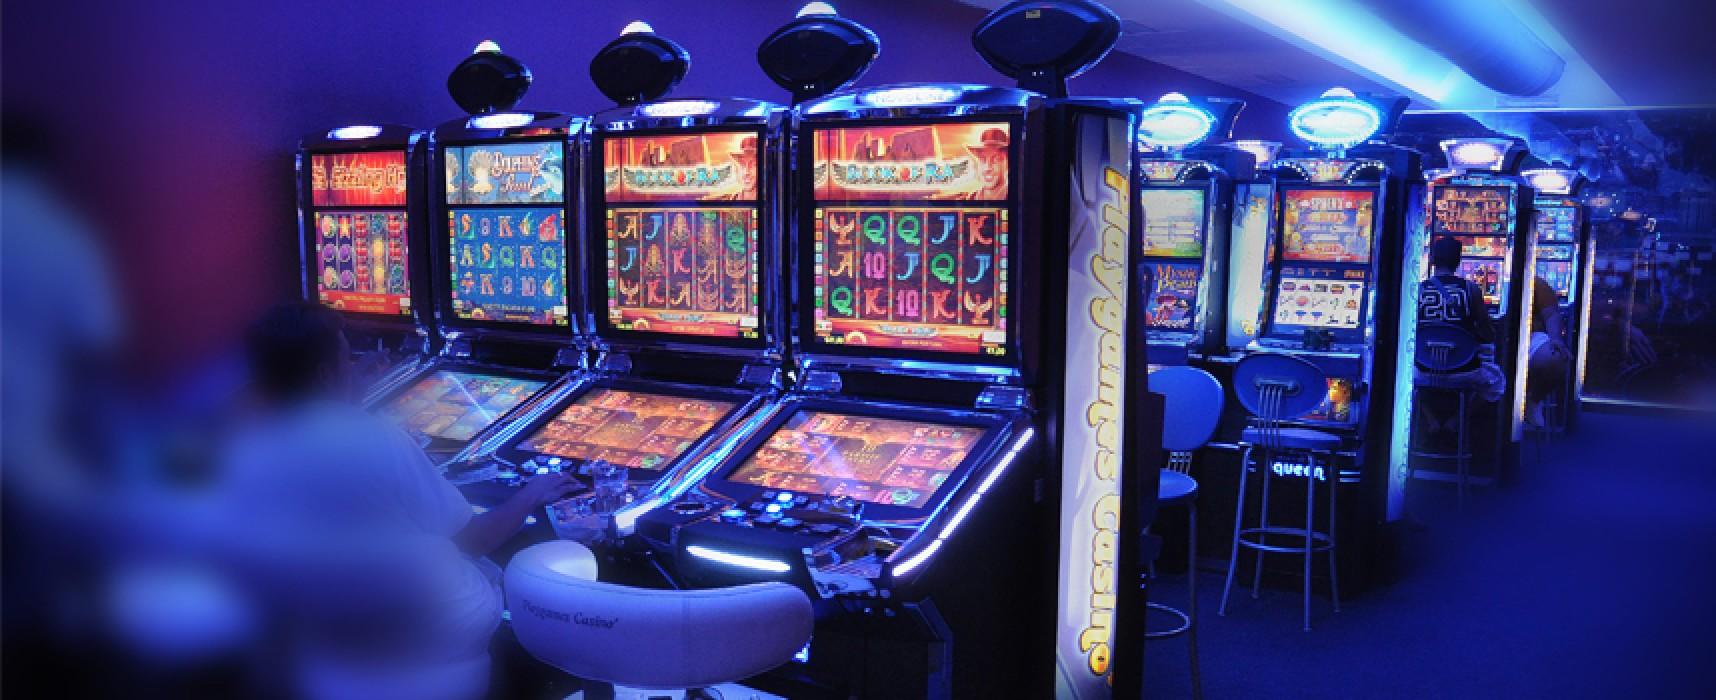 Carovana No Slot, la pastorale sociale biscegliese dice no al gioco d'azzardo